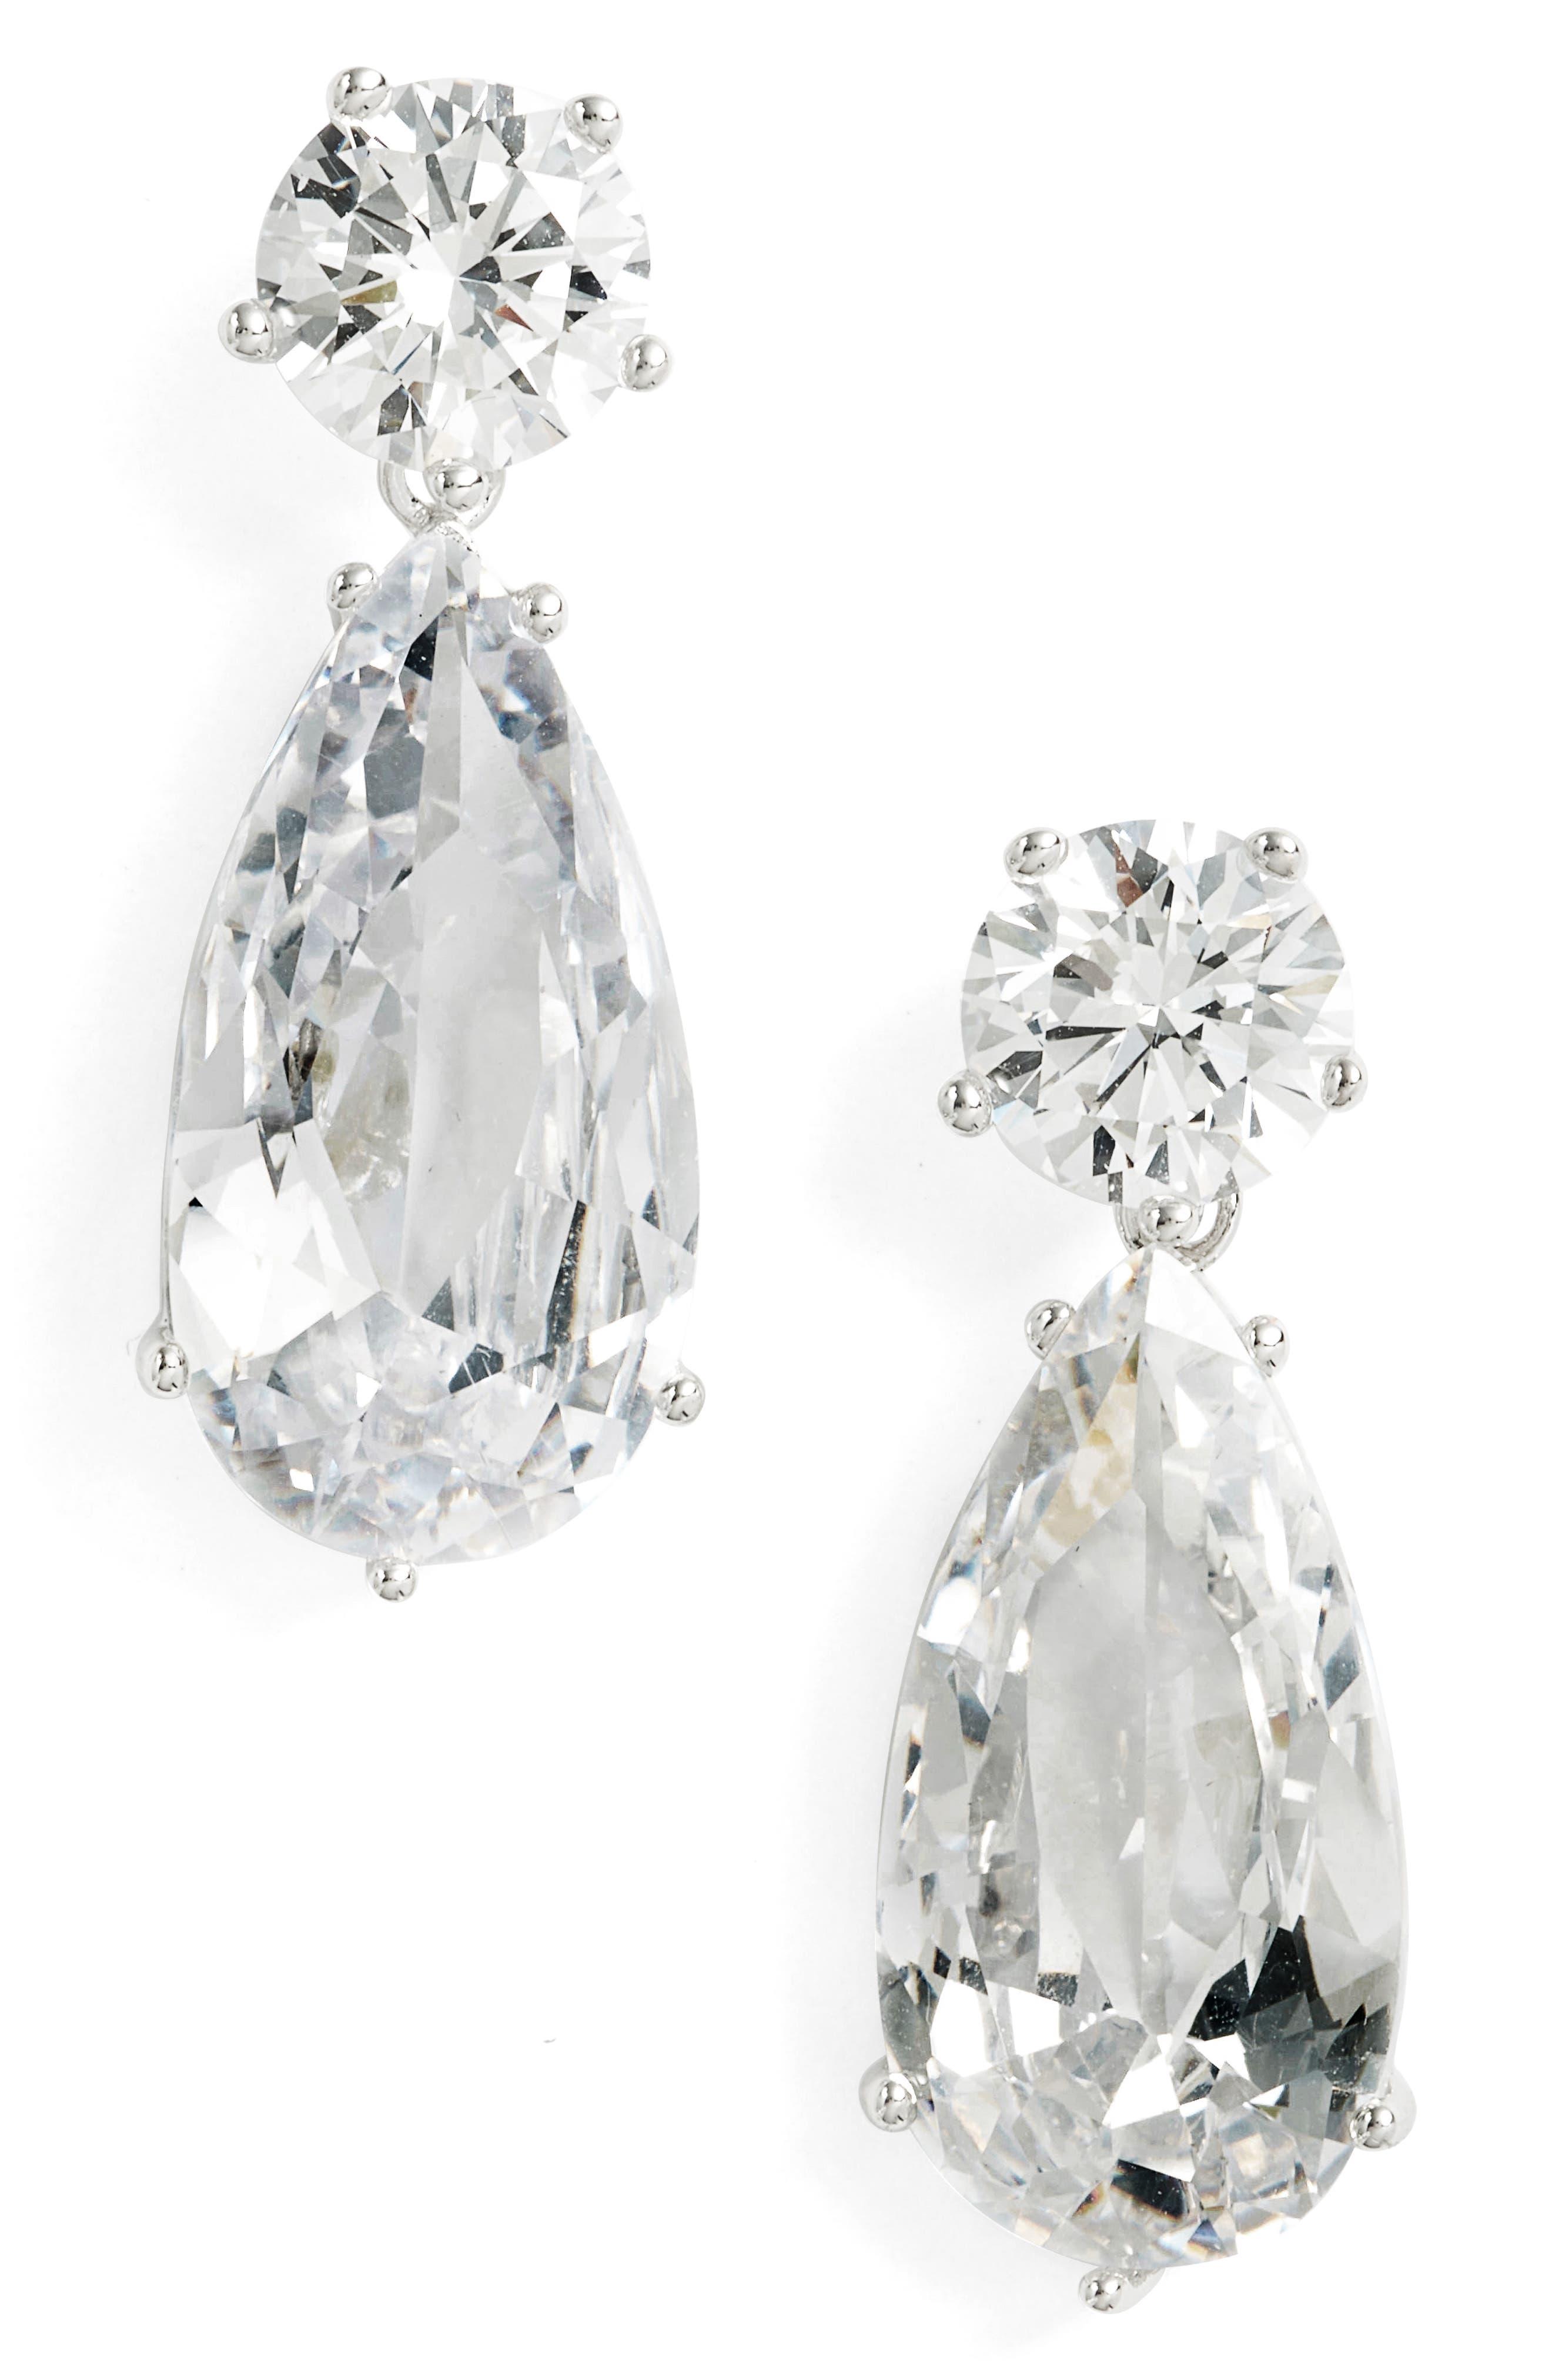 Double Drop Earrings,                             Main thumbnail 1, color,                             SILVER